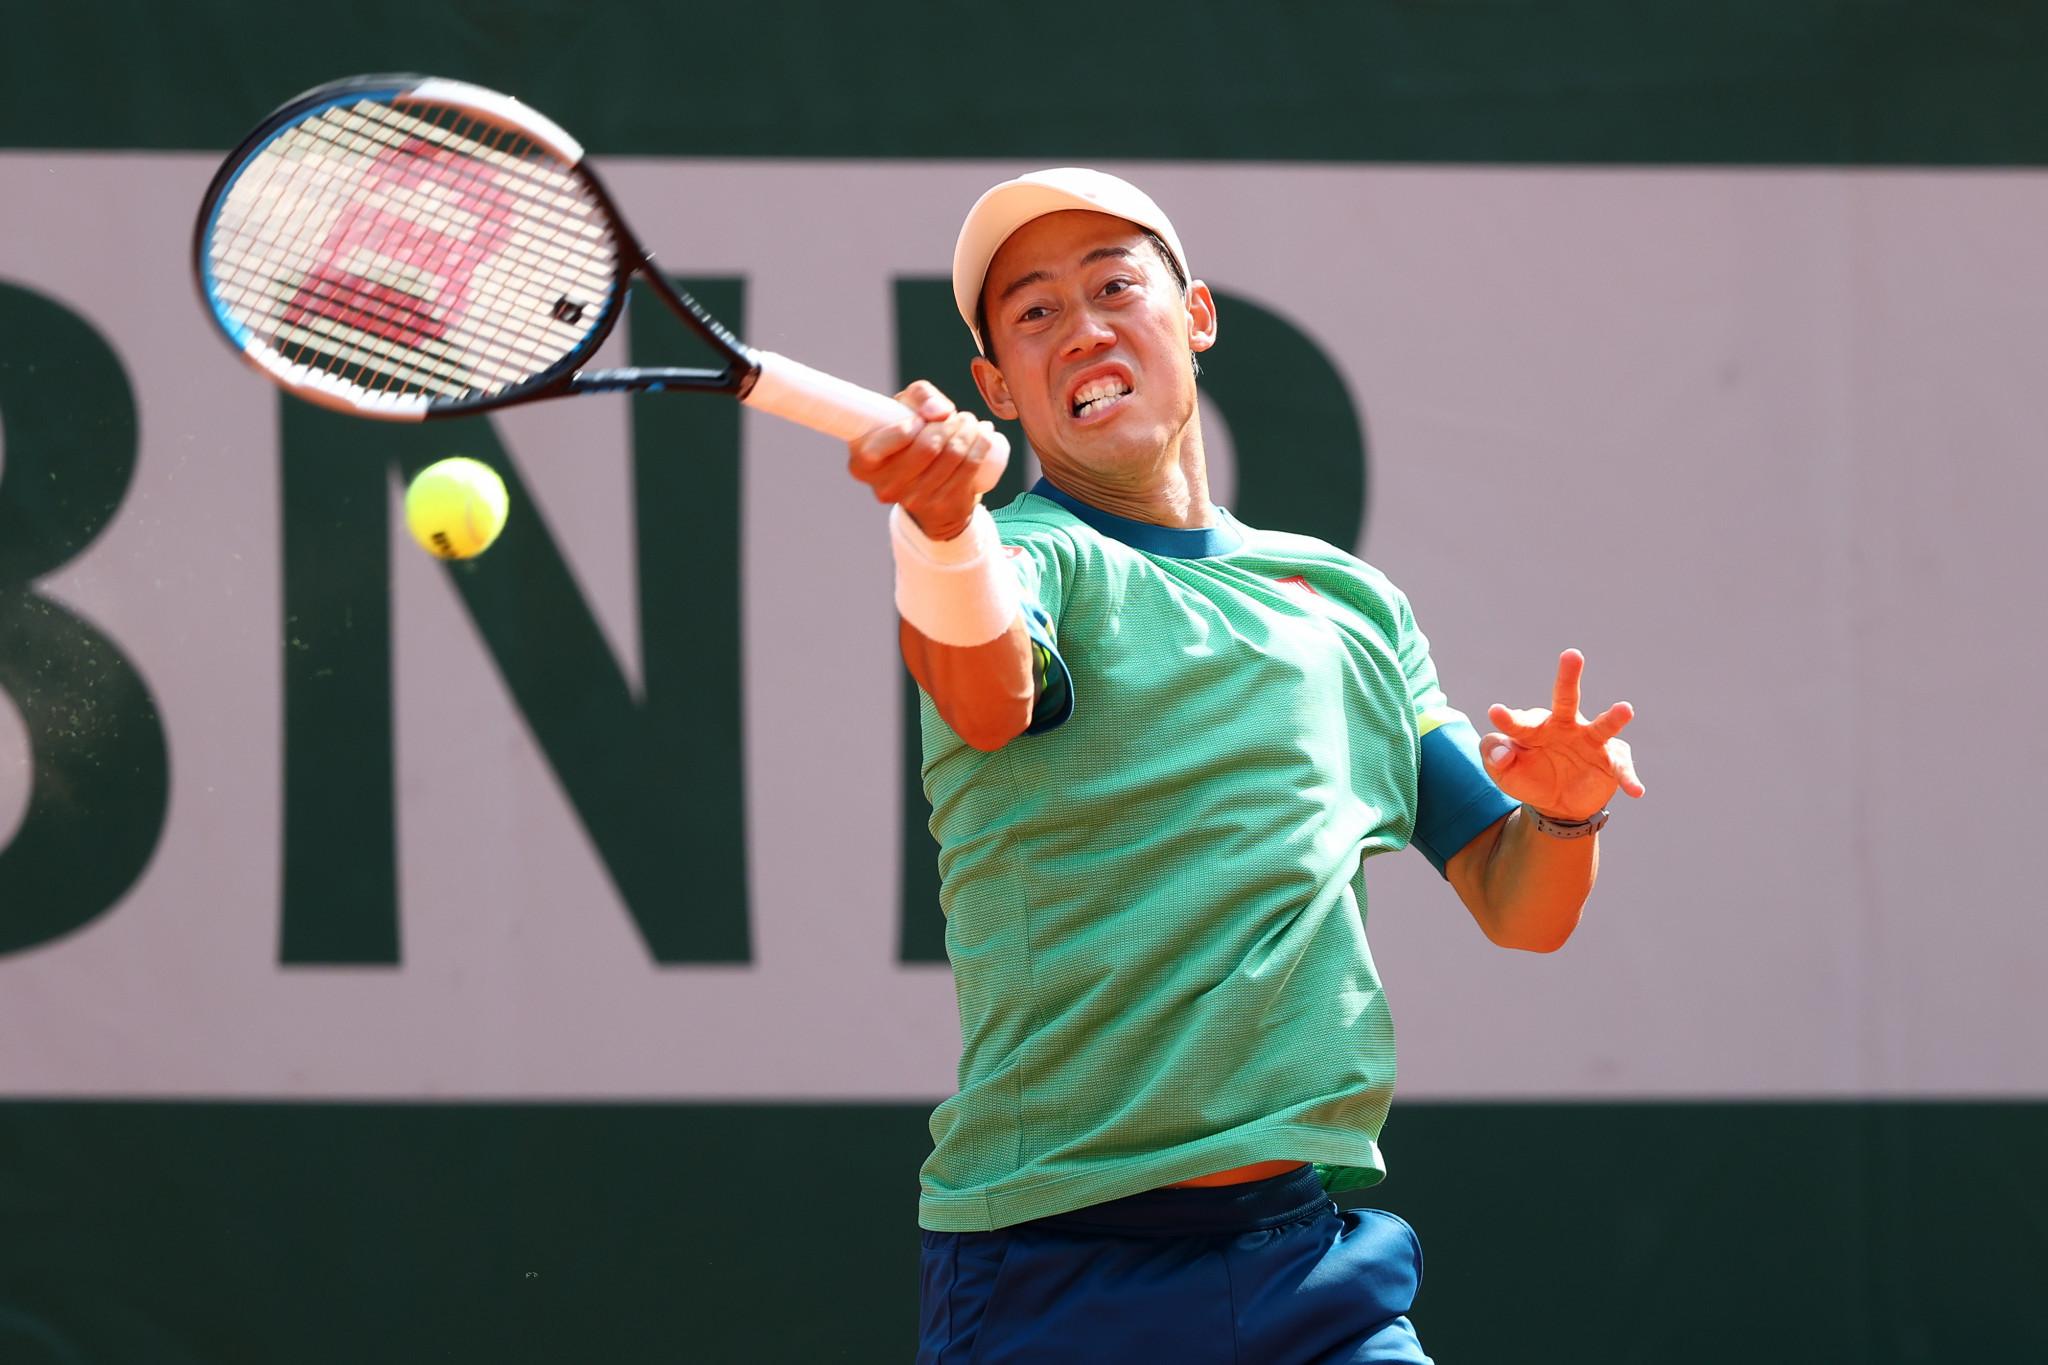 Marathon man Nishikori claims back-to-back five-set victories at French Open